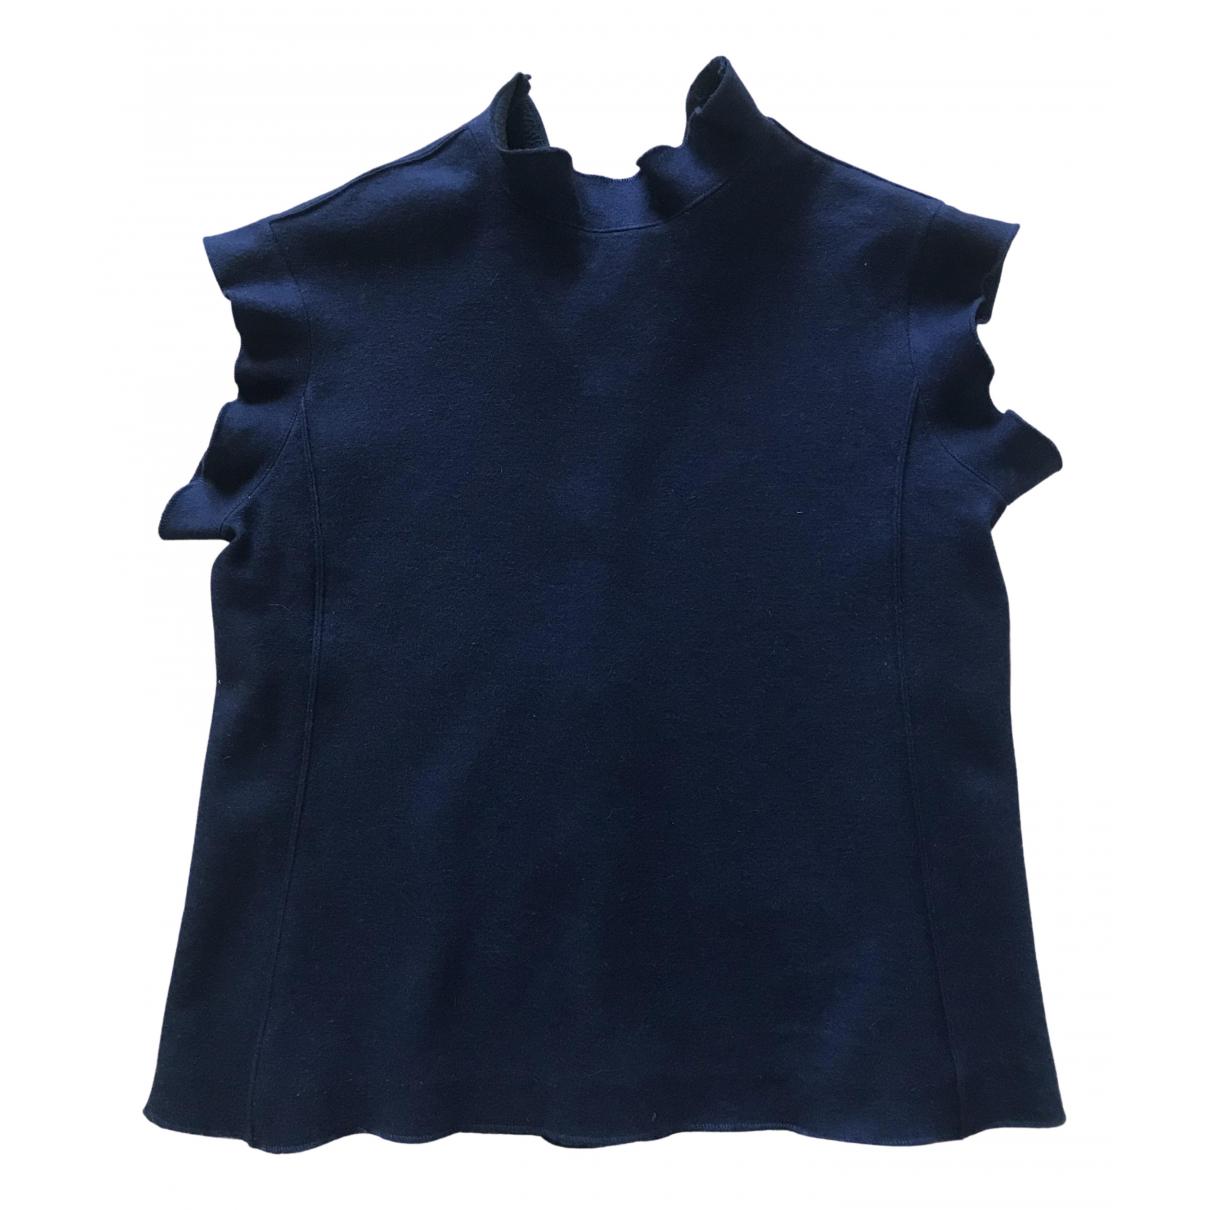 Yves Saint Laurent \N Blue Wool Shirts for Men S International